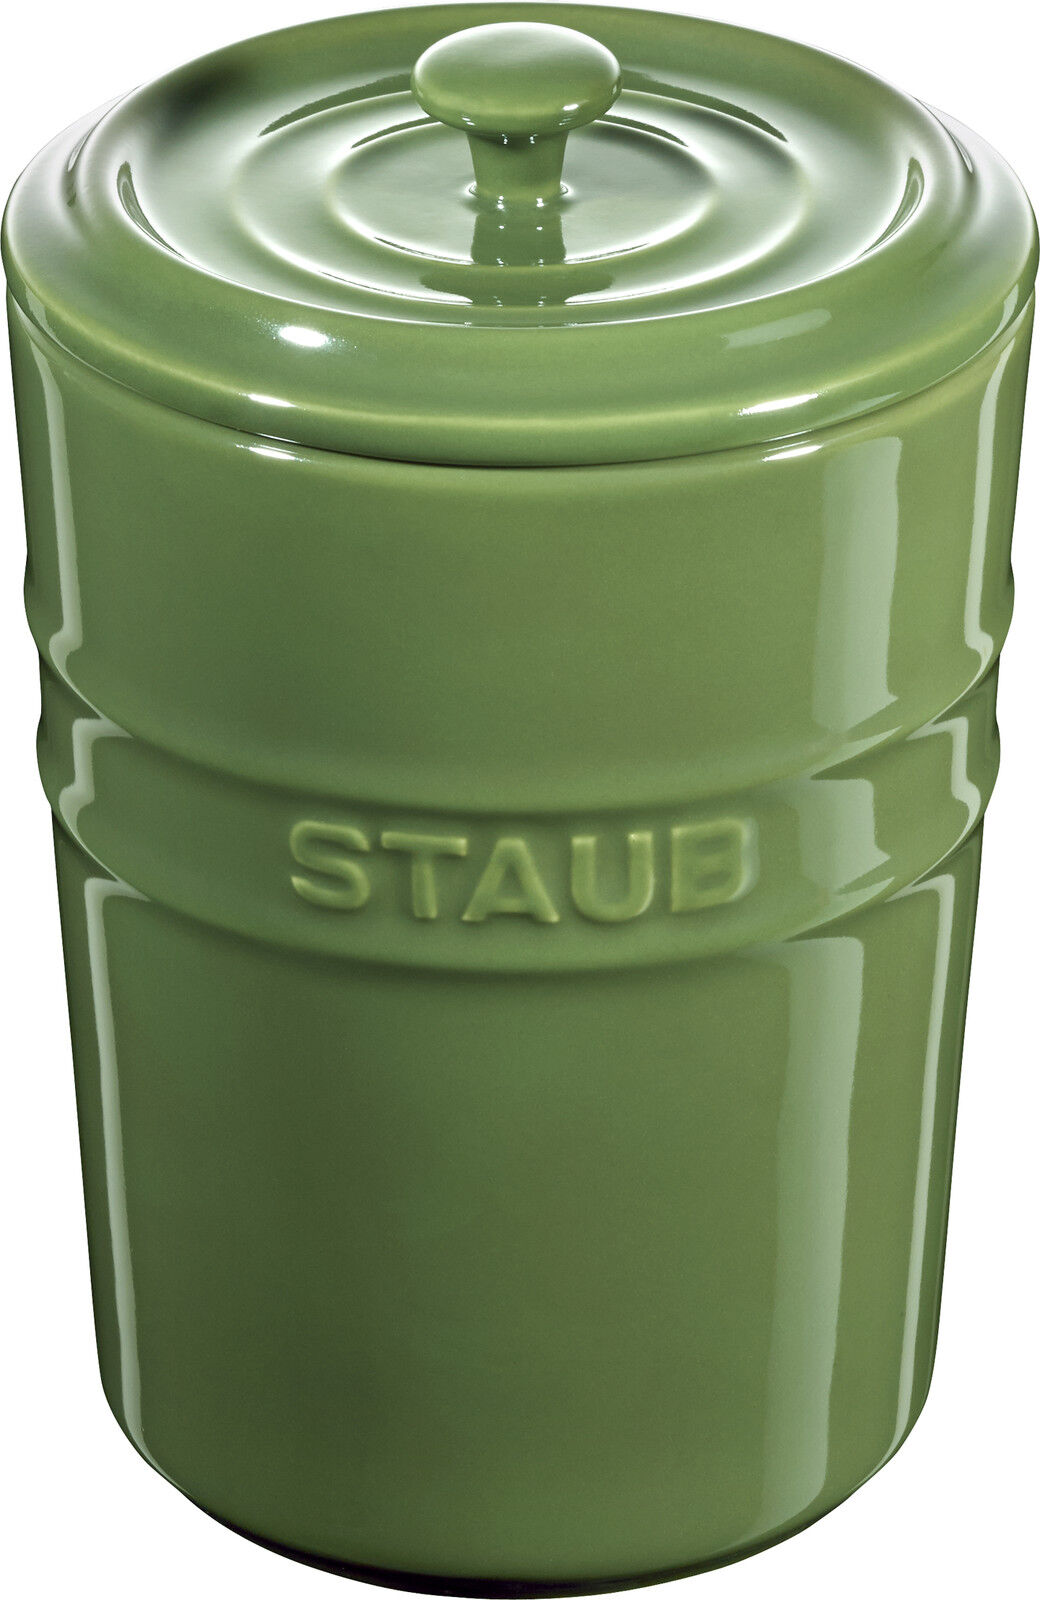 Set of Two Staub Ceramic Storage Container Storage Jar round Basil vert 1L